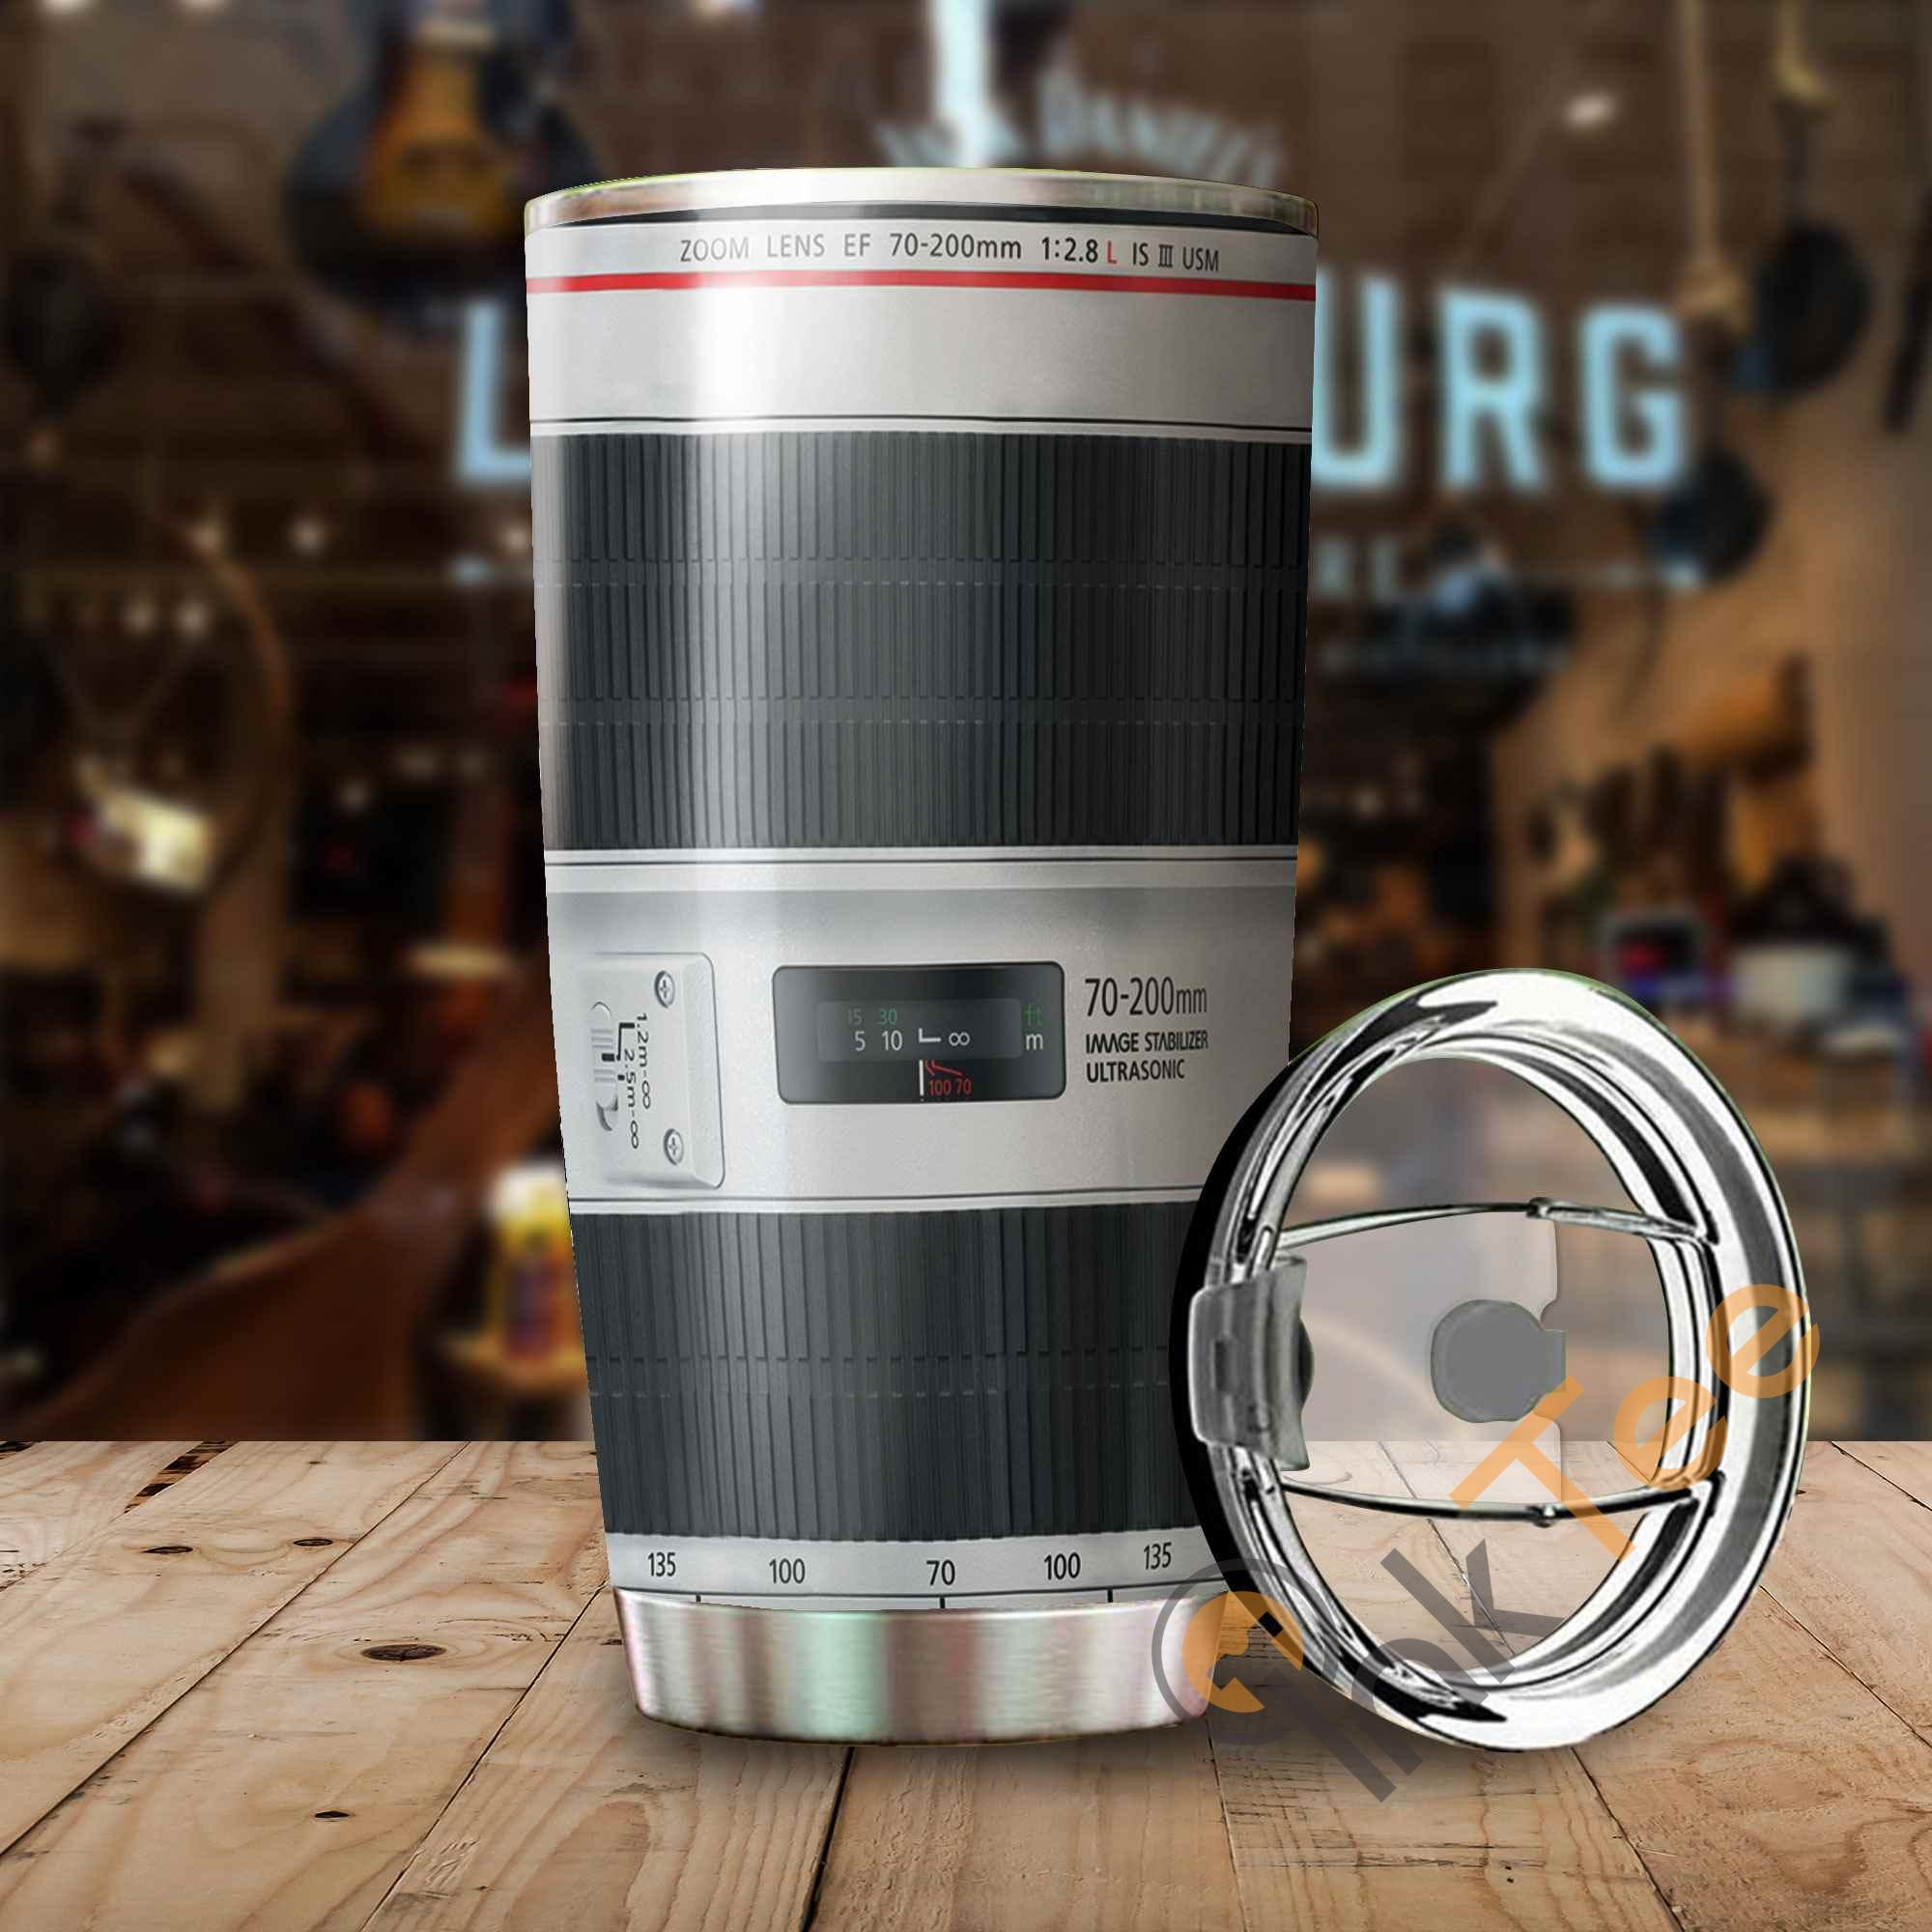 Camera Lens Top Amazon Best Seller Sku 3598 Stainless Steel Tumbler